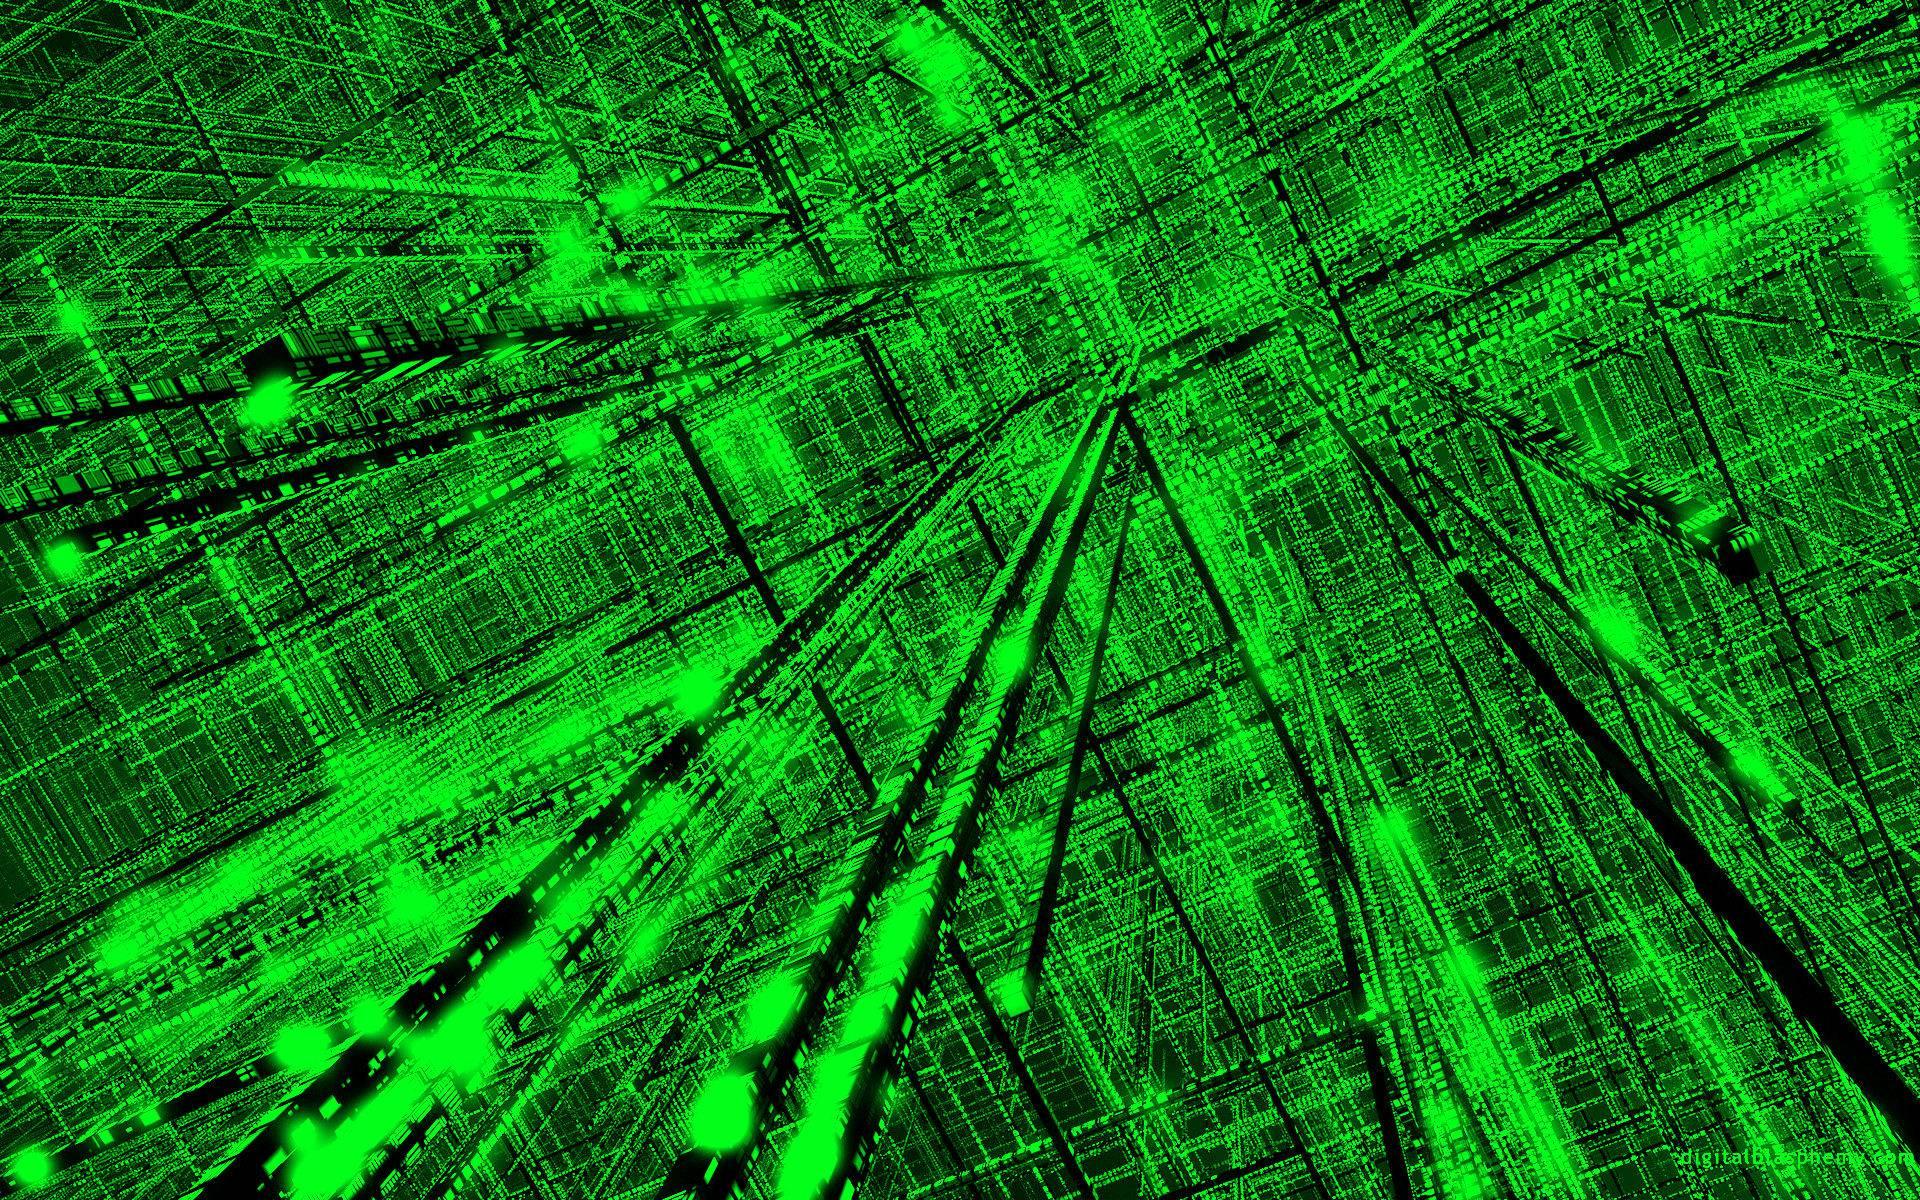 technology wallpapers information physical matrix universe system illuminati wakingtimes maclean wallpapercave